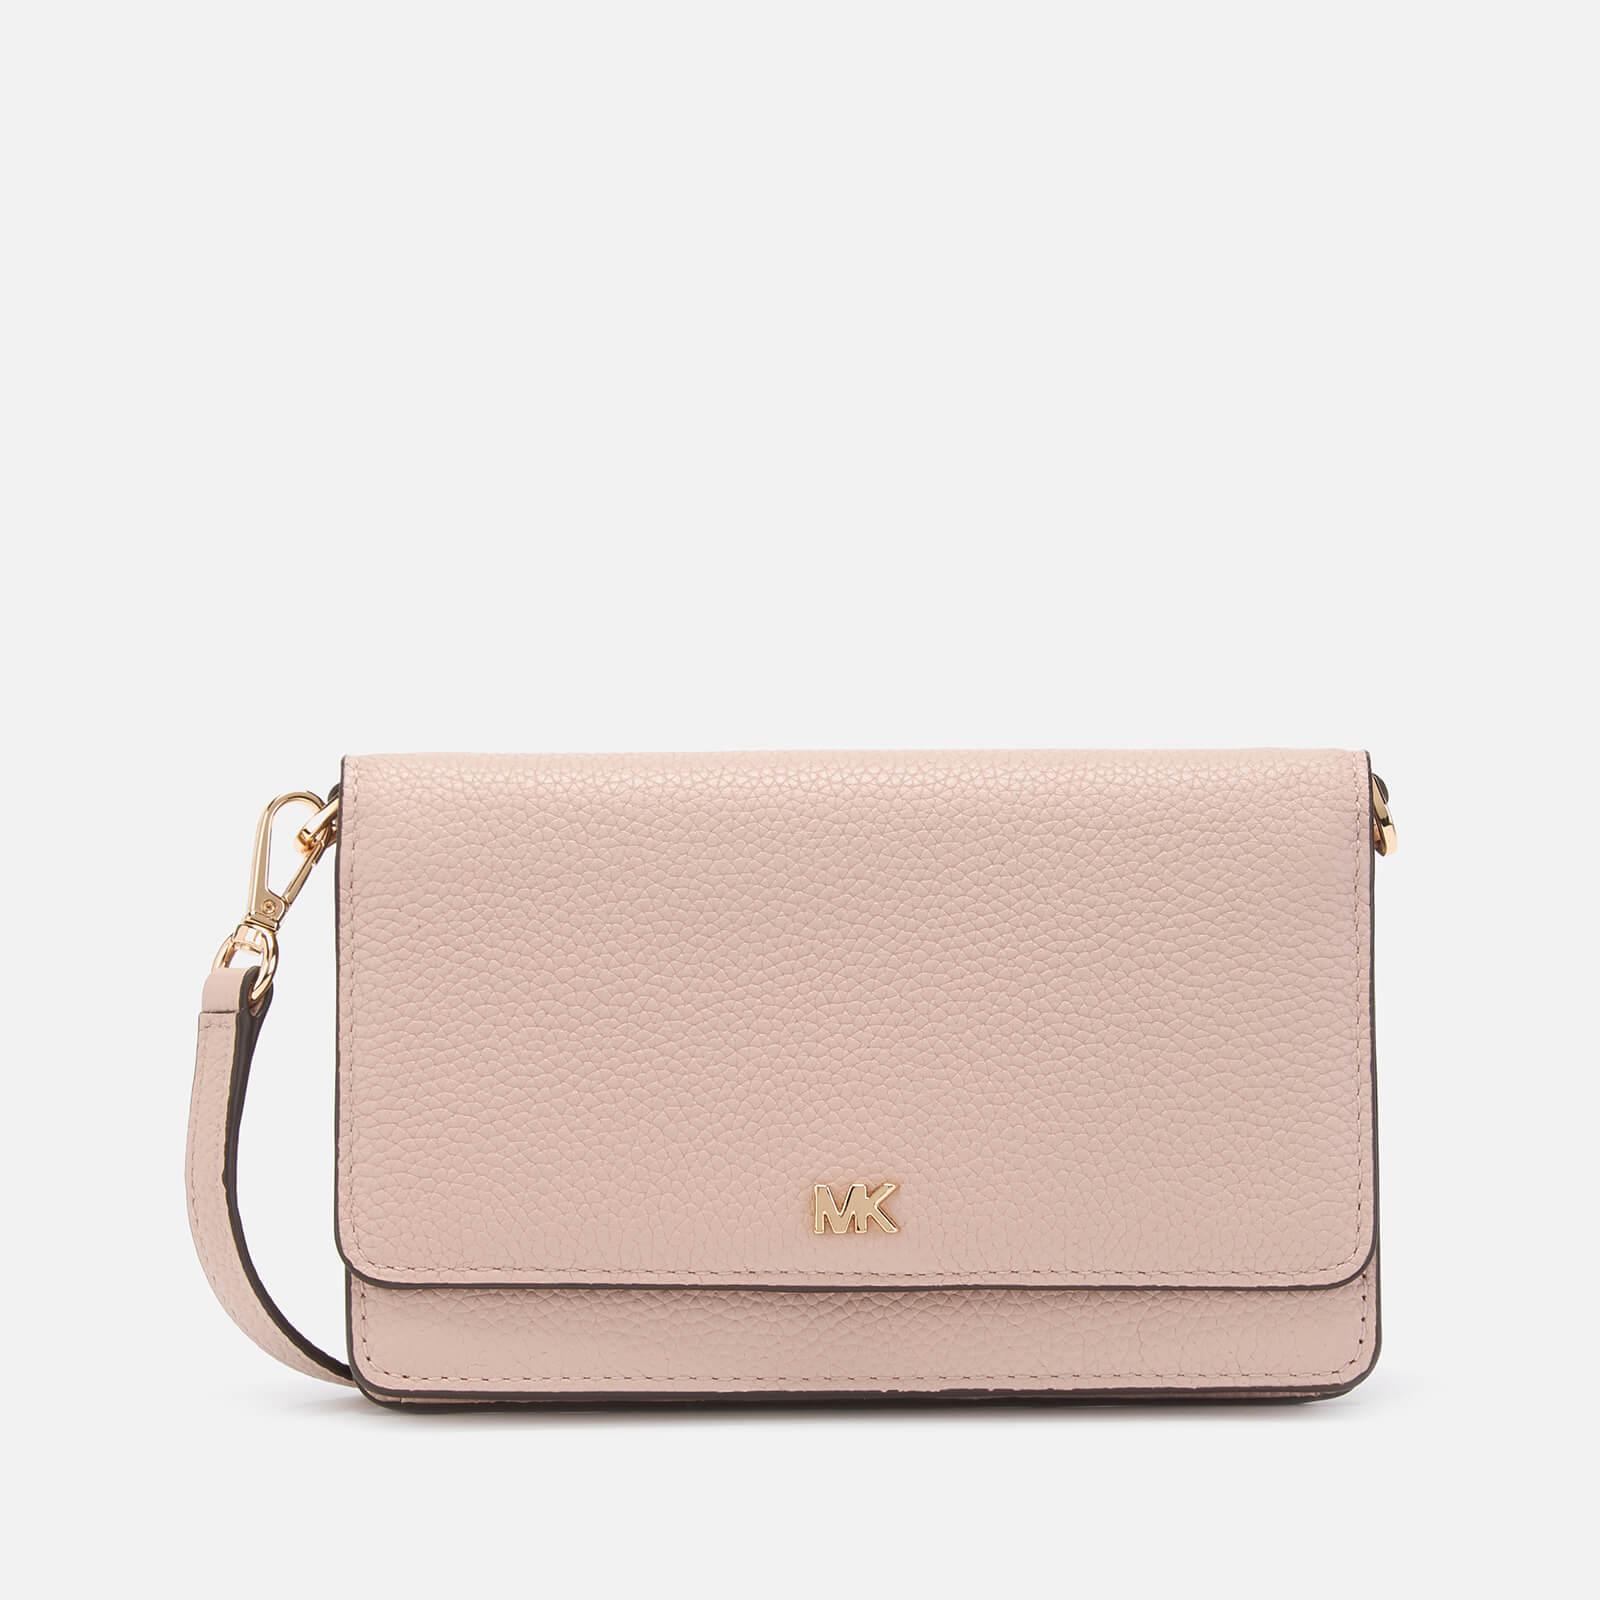 MICHAEL MICHAEL KORS Women's Crossbodies Phone Cross Body Bag - Soft Pink